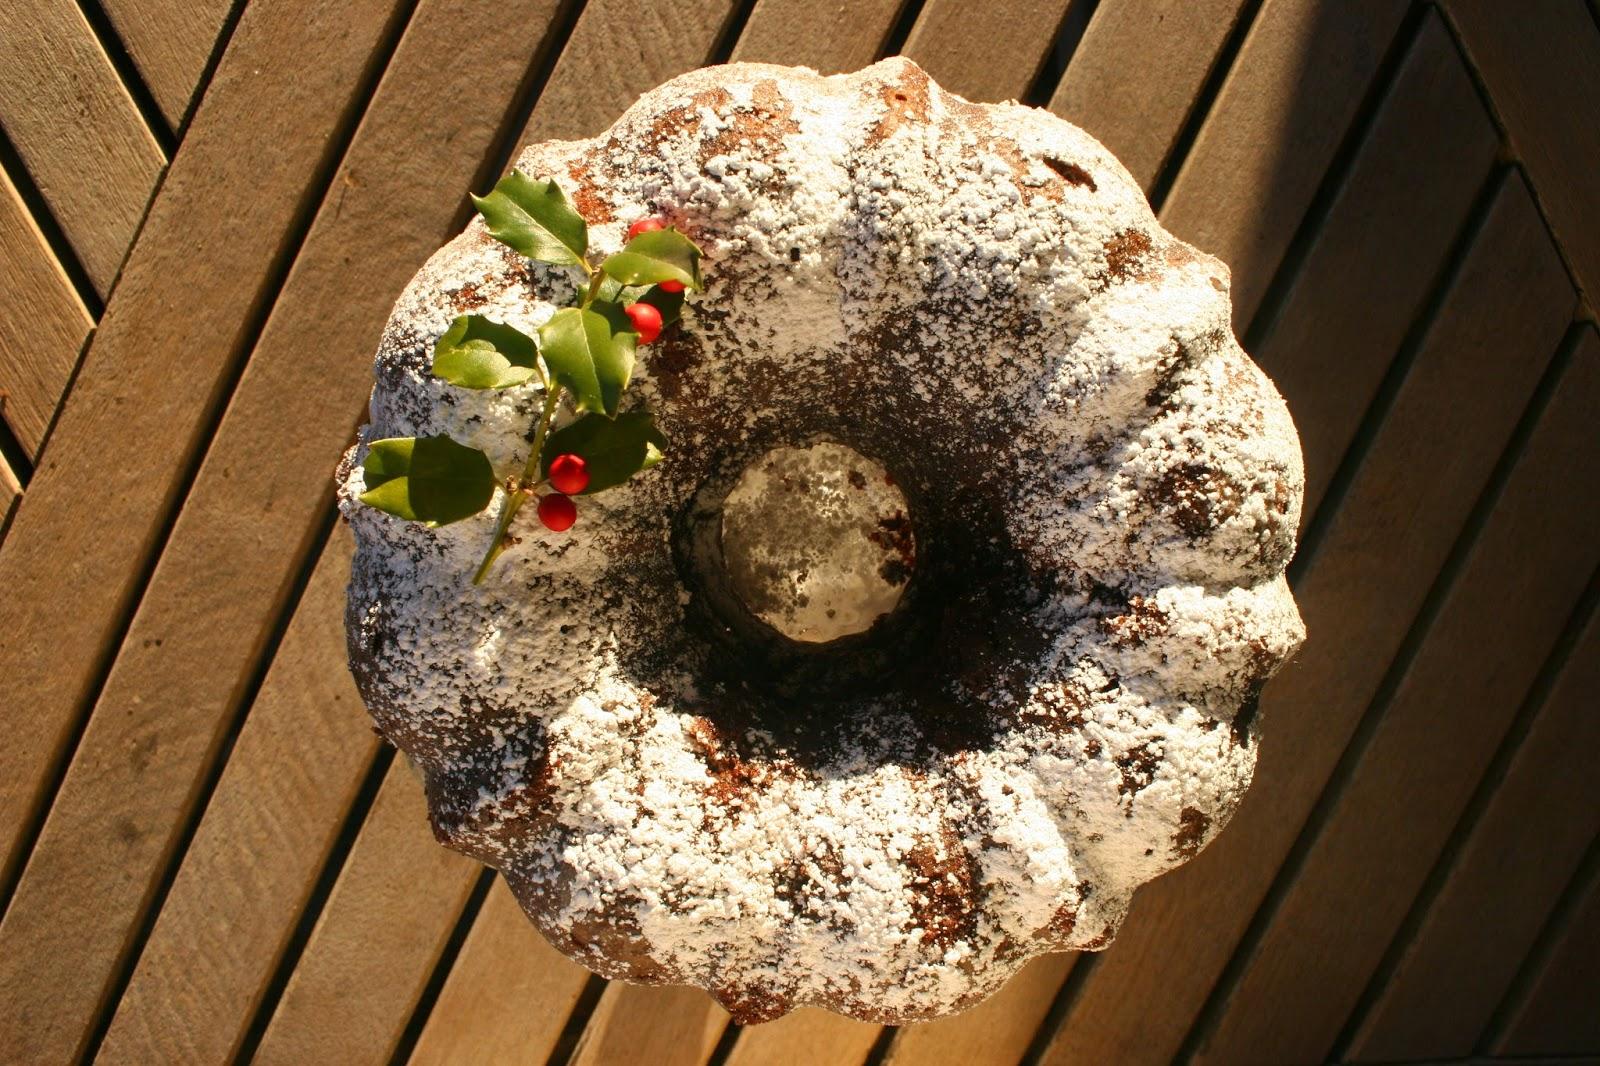 Whiskey-Soaked Dark Chocolate Bundt Cake with holly